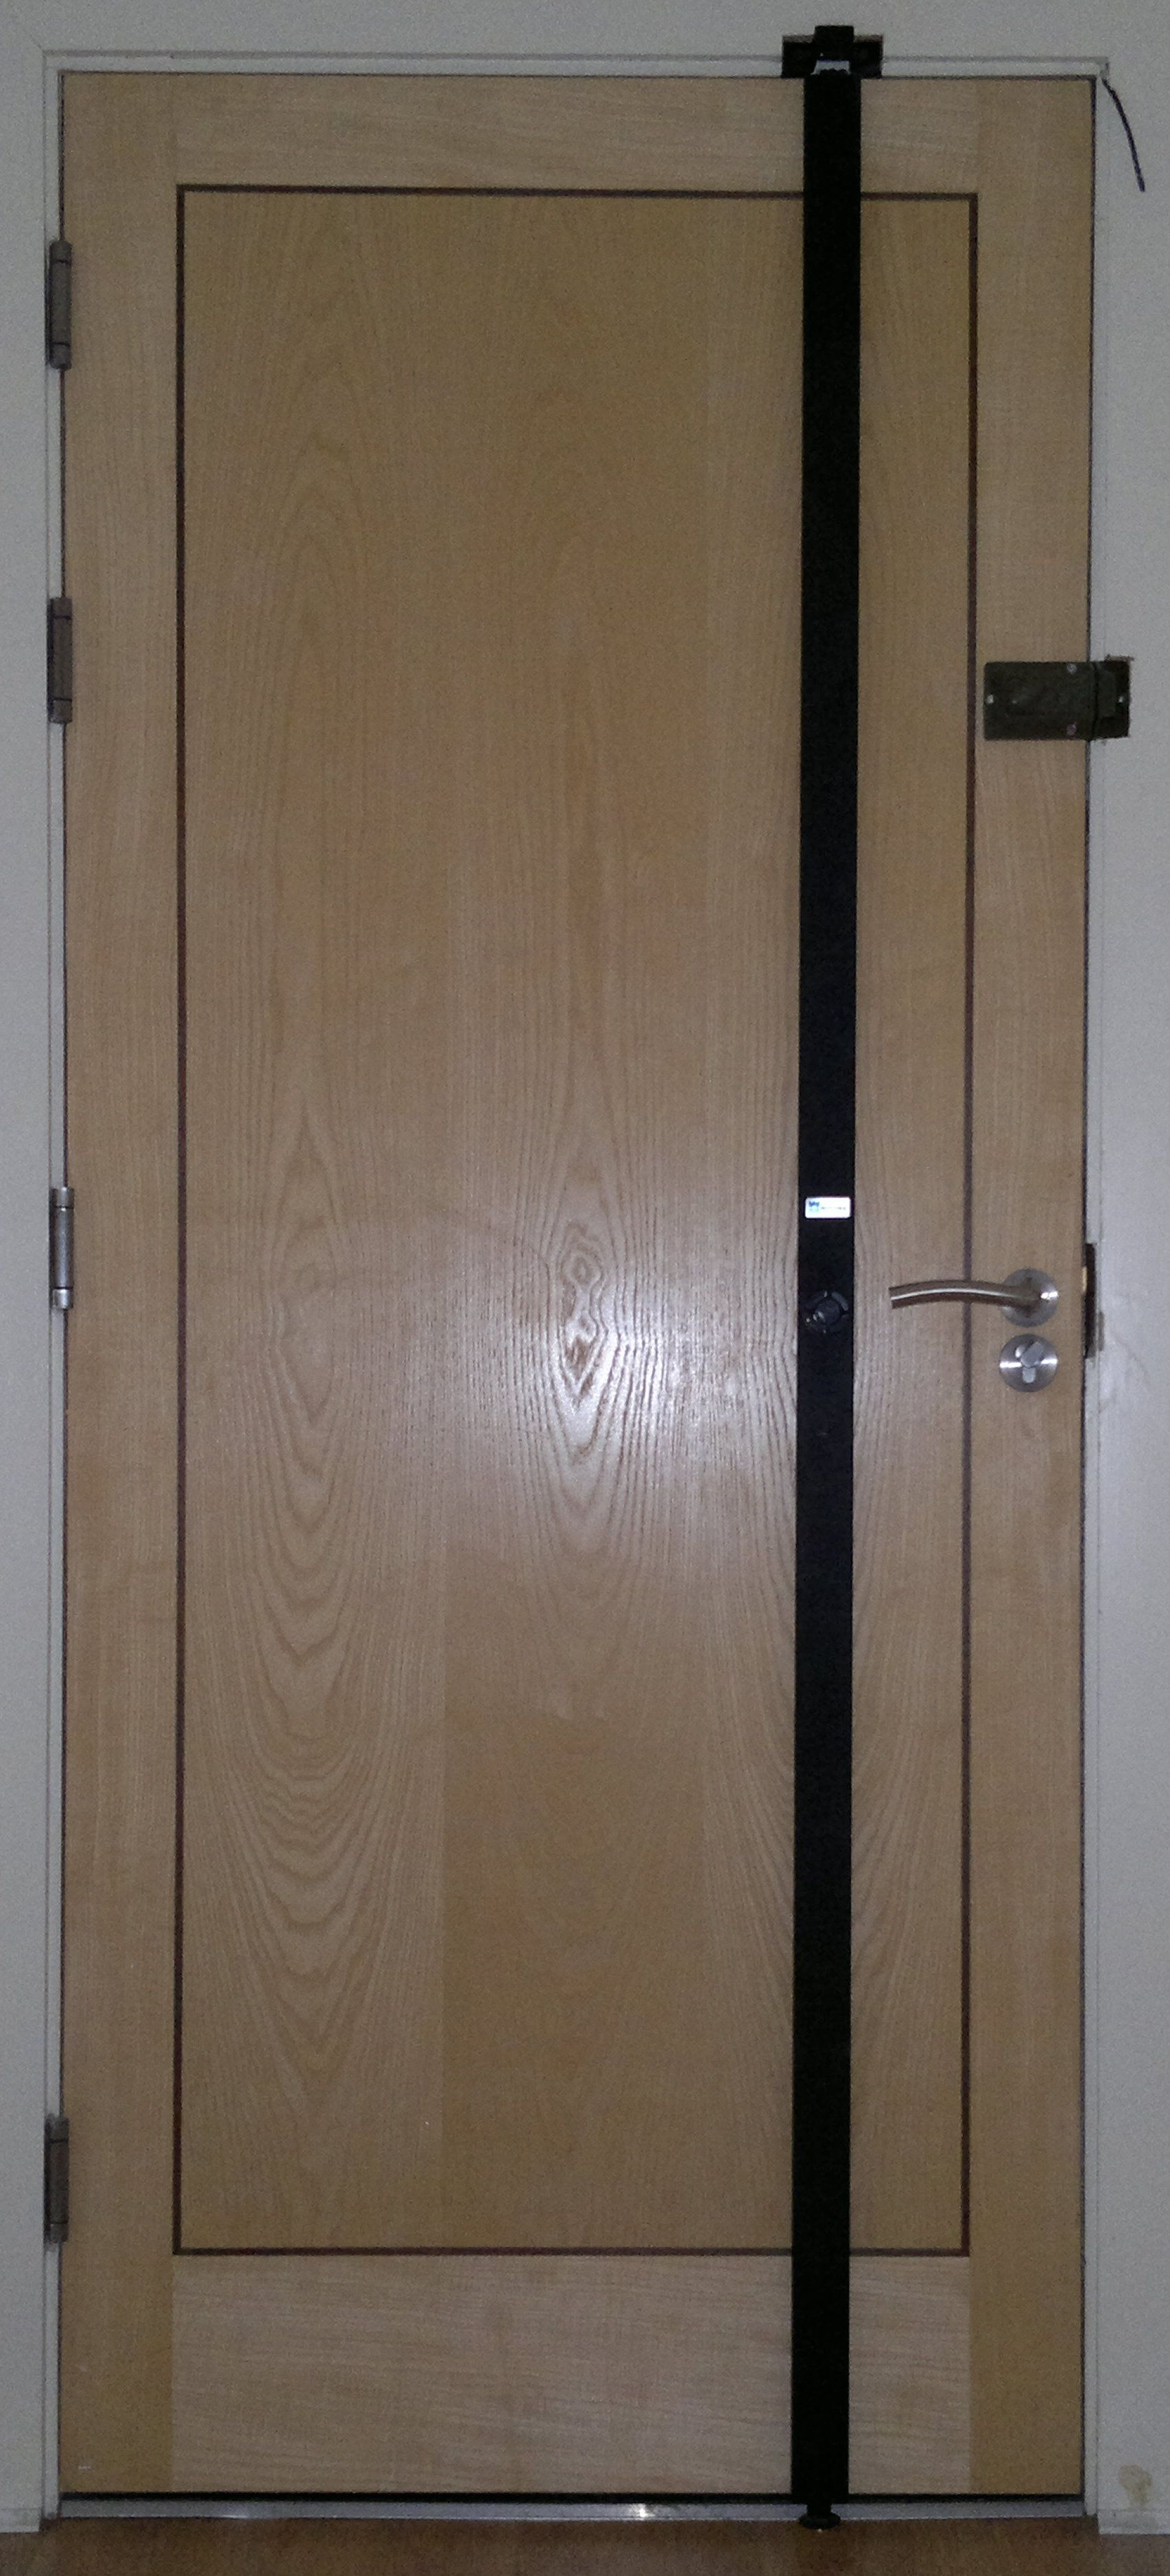 Home Front Door Security Bar | http://franzdondi.com | Pinterest ...